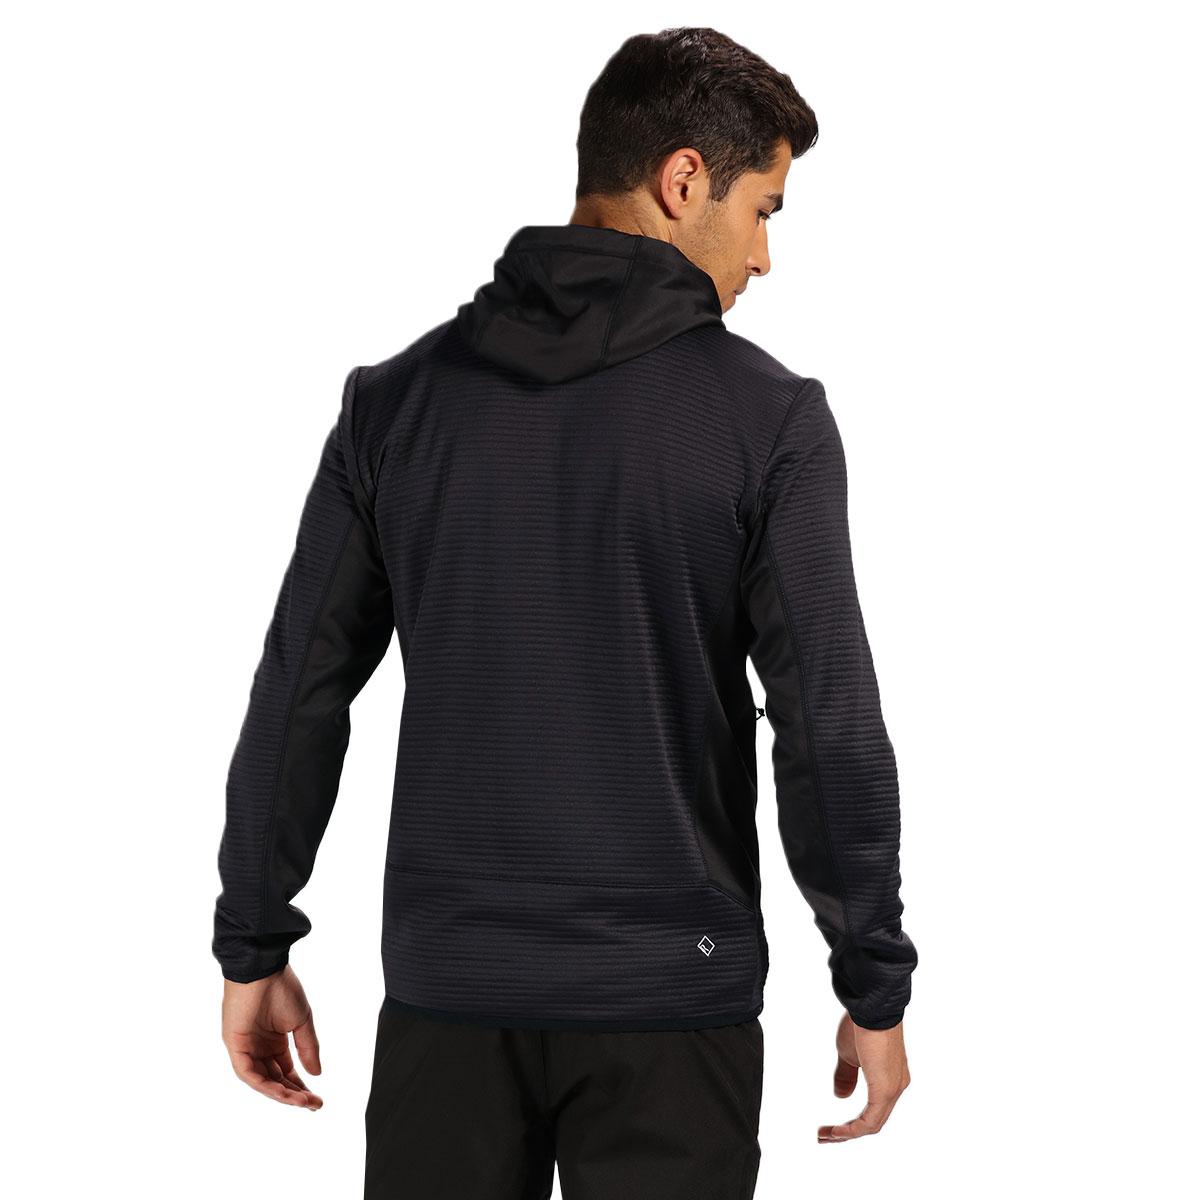 Regatta-Mens-Tarnis-II-Ribbed-Fabric-Stretch-Hoody-Jacket-70-OFF-RRP thumbnail 3